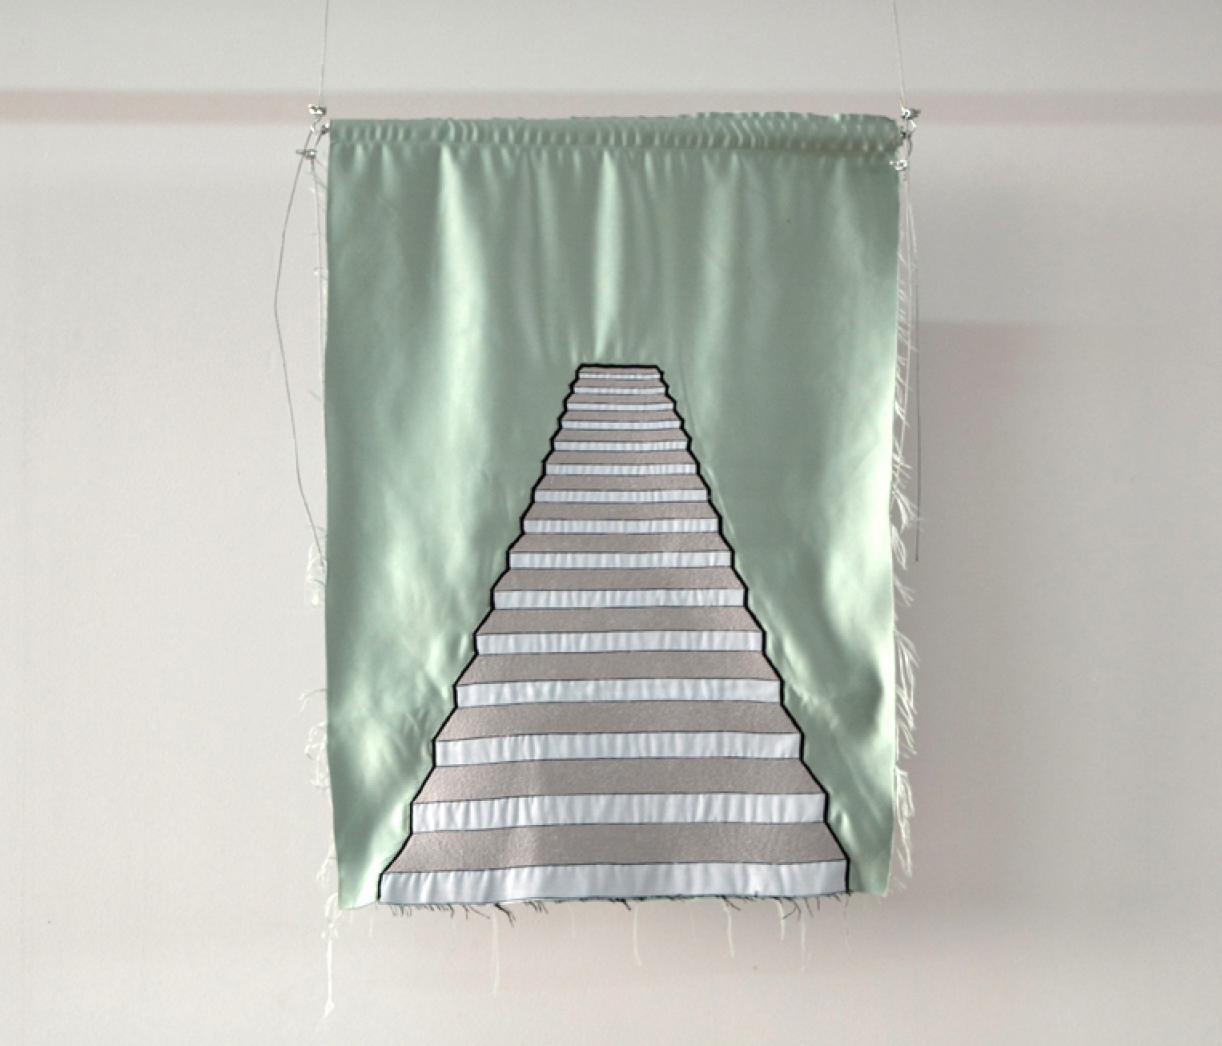 Blazon: Achrafiye, Stairs, 2015, Embroidery and applique on textile, 81.5 x 59 cm, Ed. 3 + 2 AP